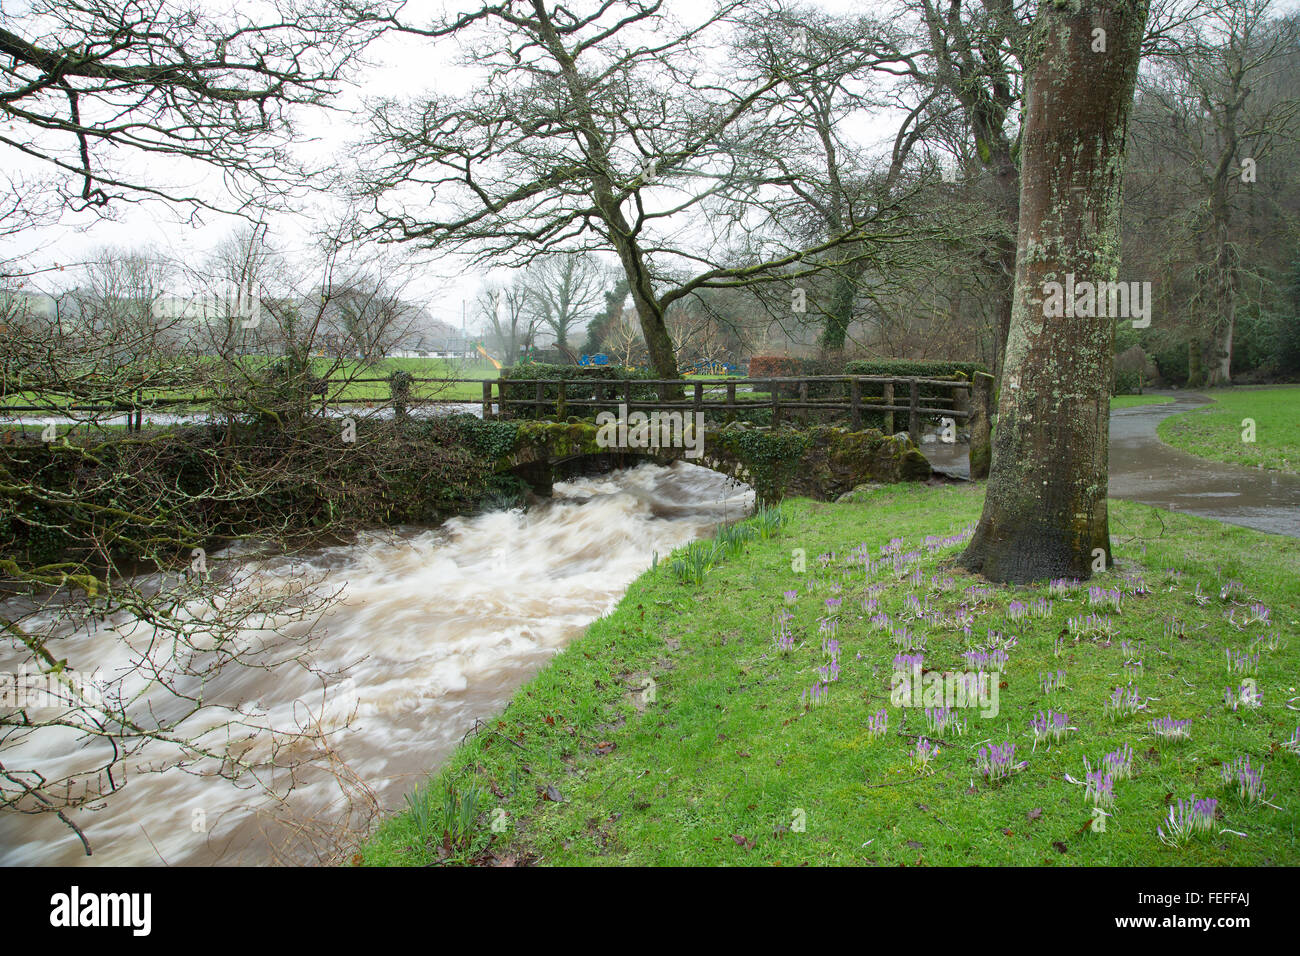 Okehampton, Devon, UK. 6th February, 2016. High river levels at Simmons Park in Okehampton during storm Credit: - Stock Image